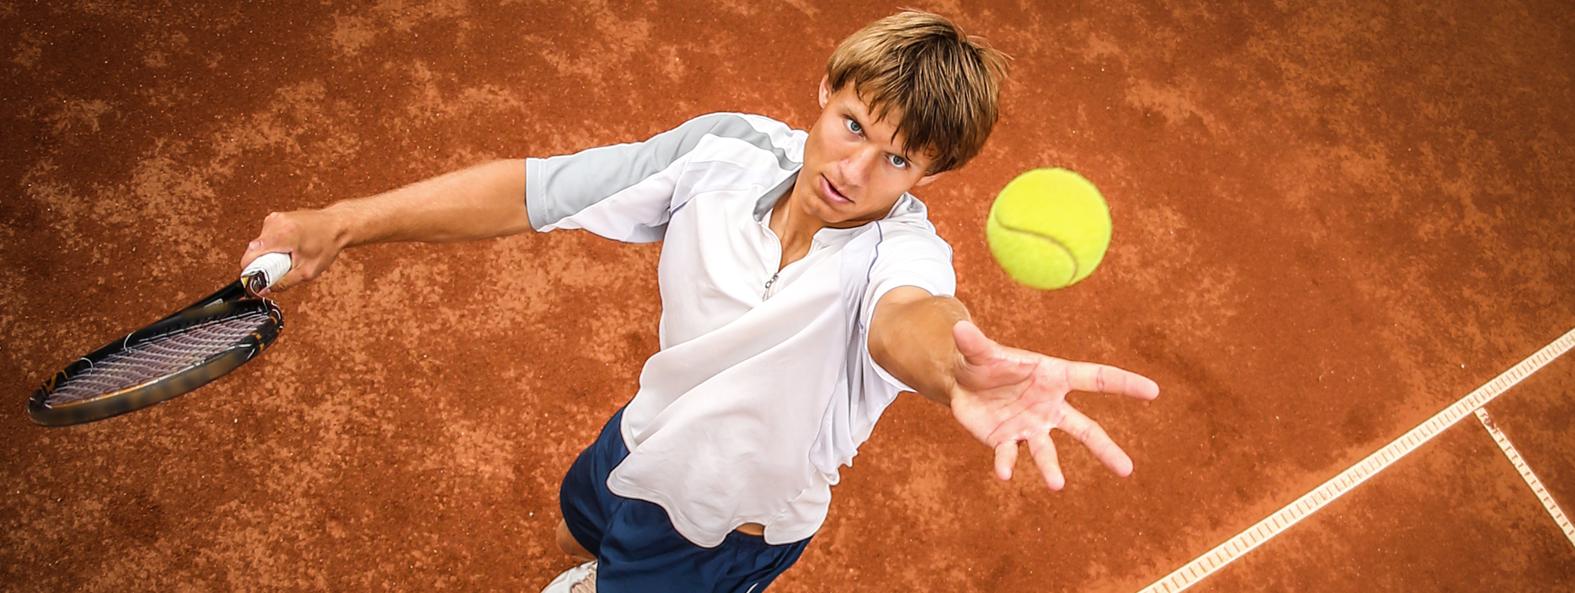 Tennis - Turnier